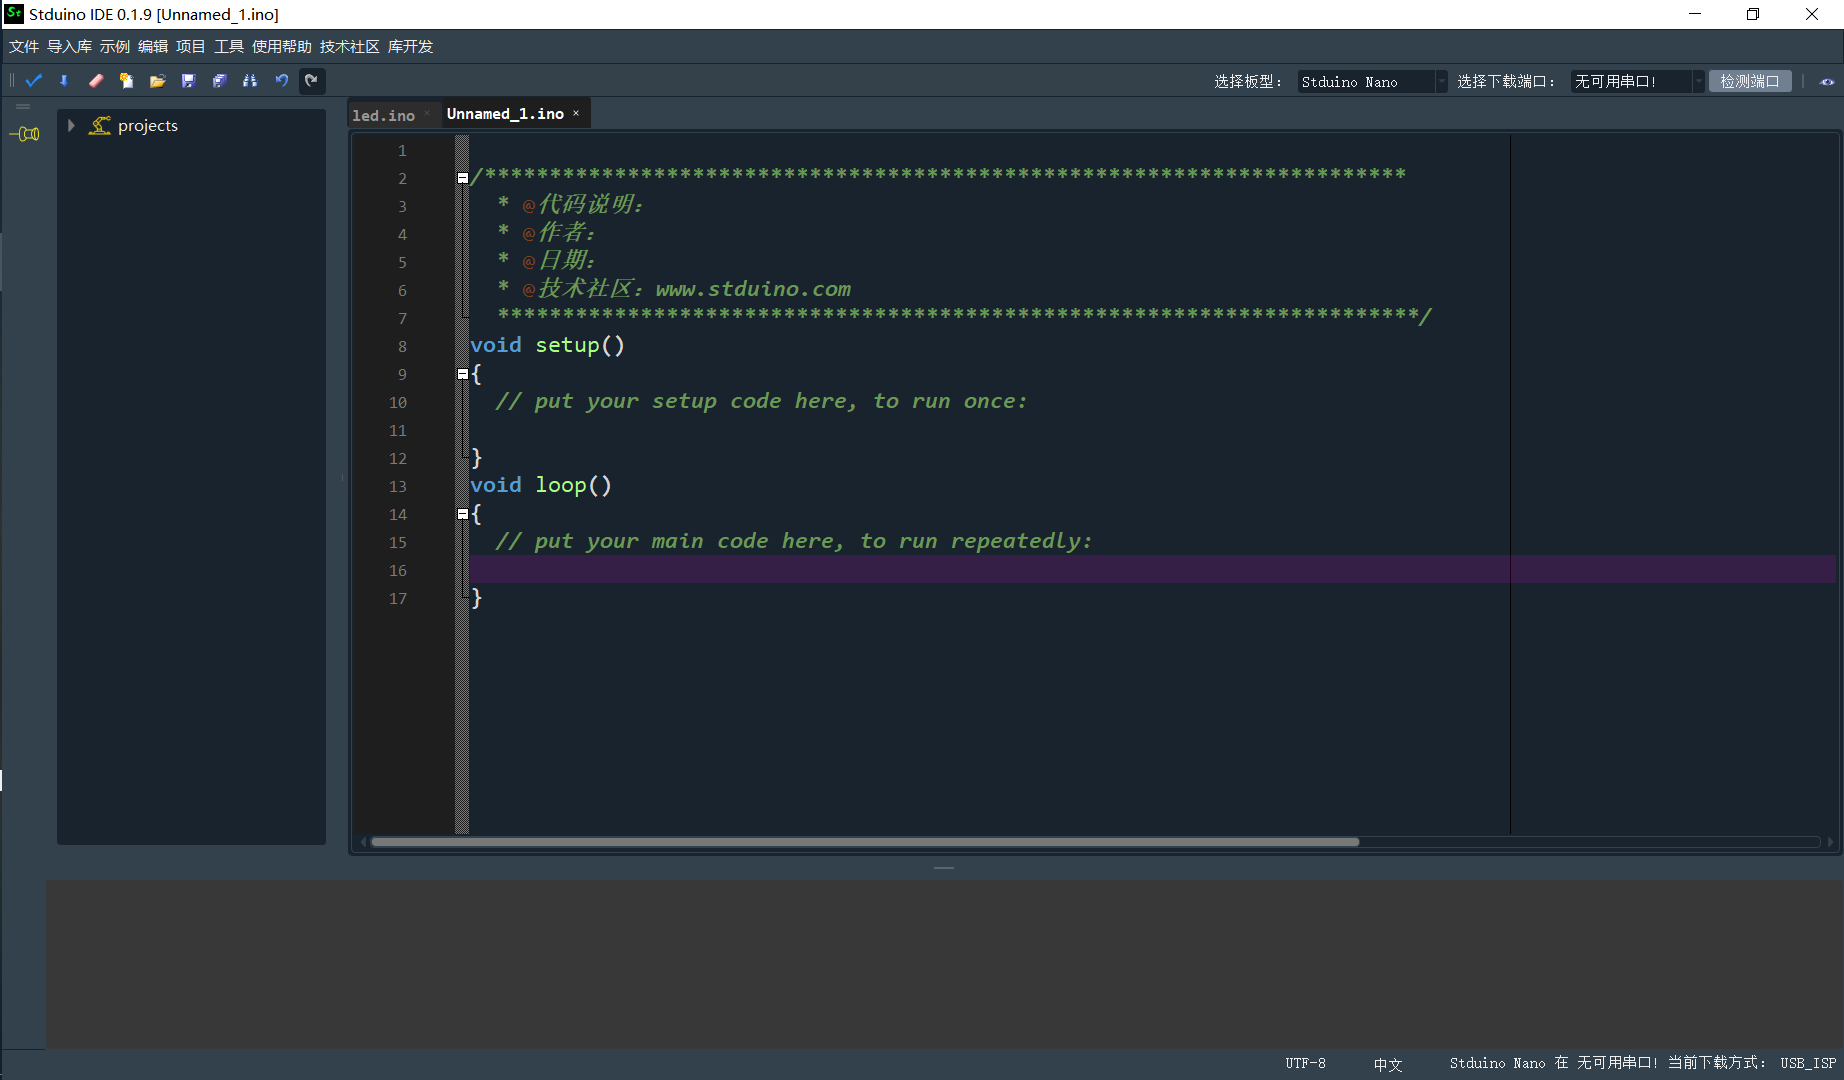 Stduino IDE 编辑界面